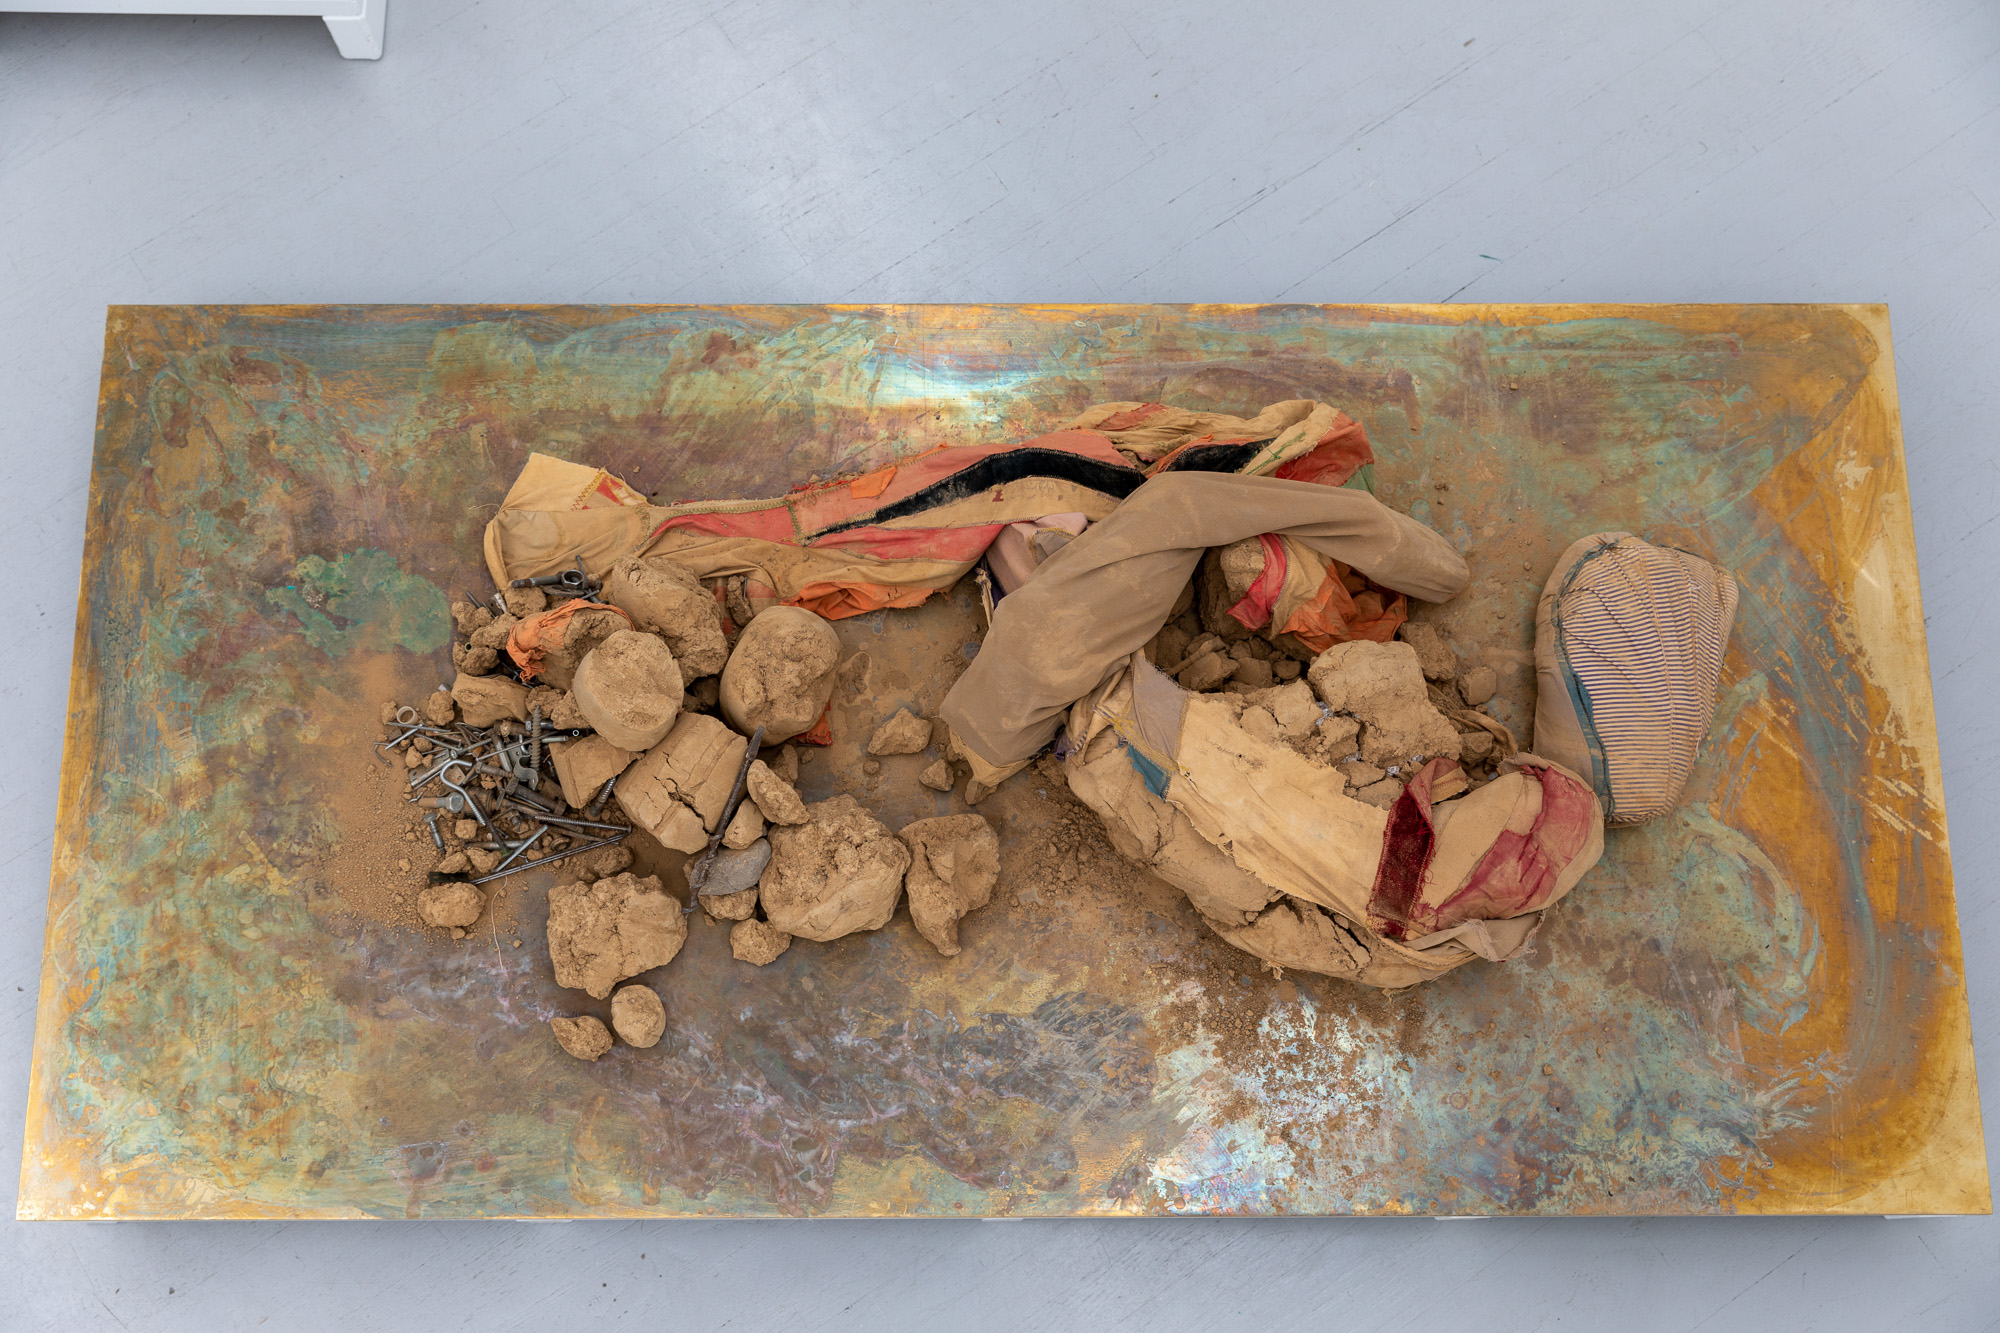 Palett Universe, 2020. Mixed media (textile, clay, steel, powder-coated steel, brass, plywood) on artist designed pedestal, 36 x 200 x 100 cm